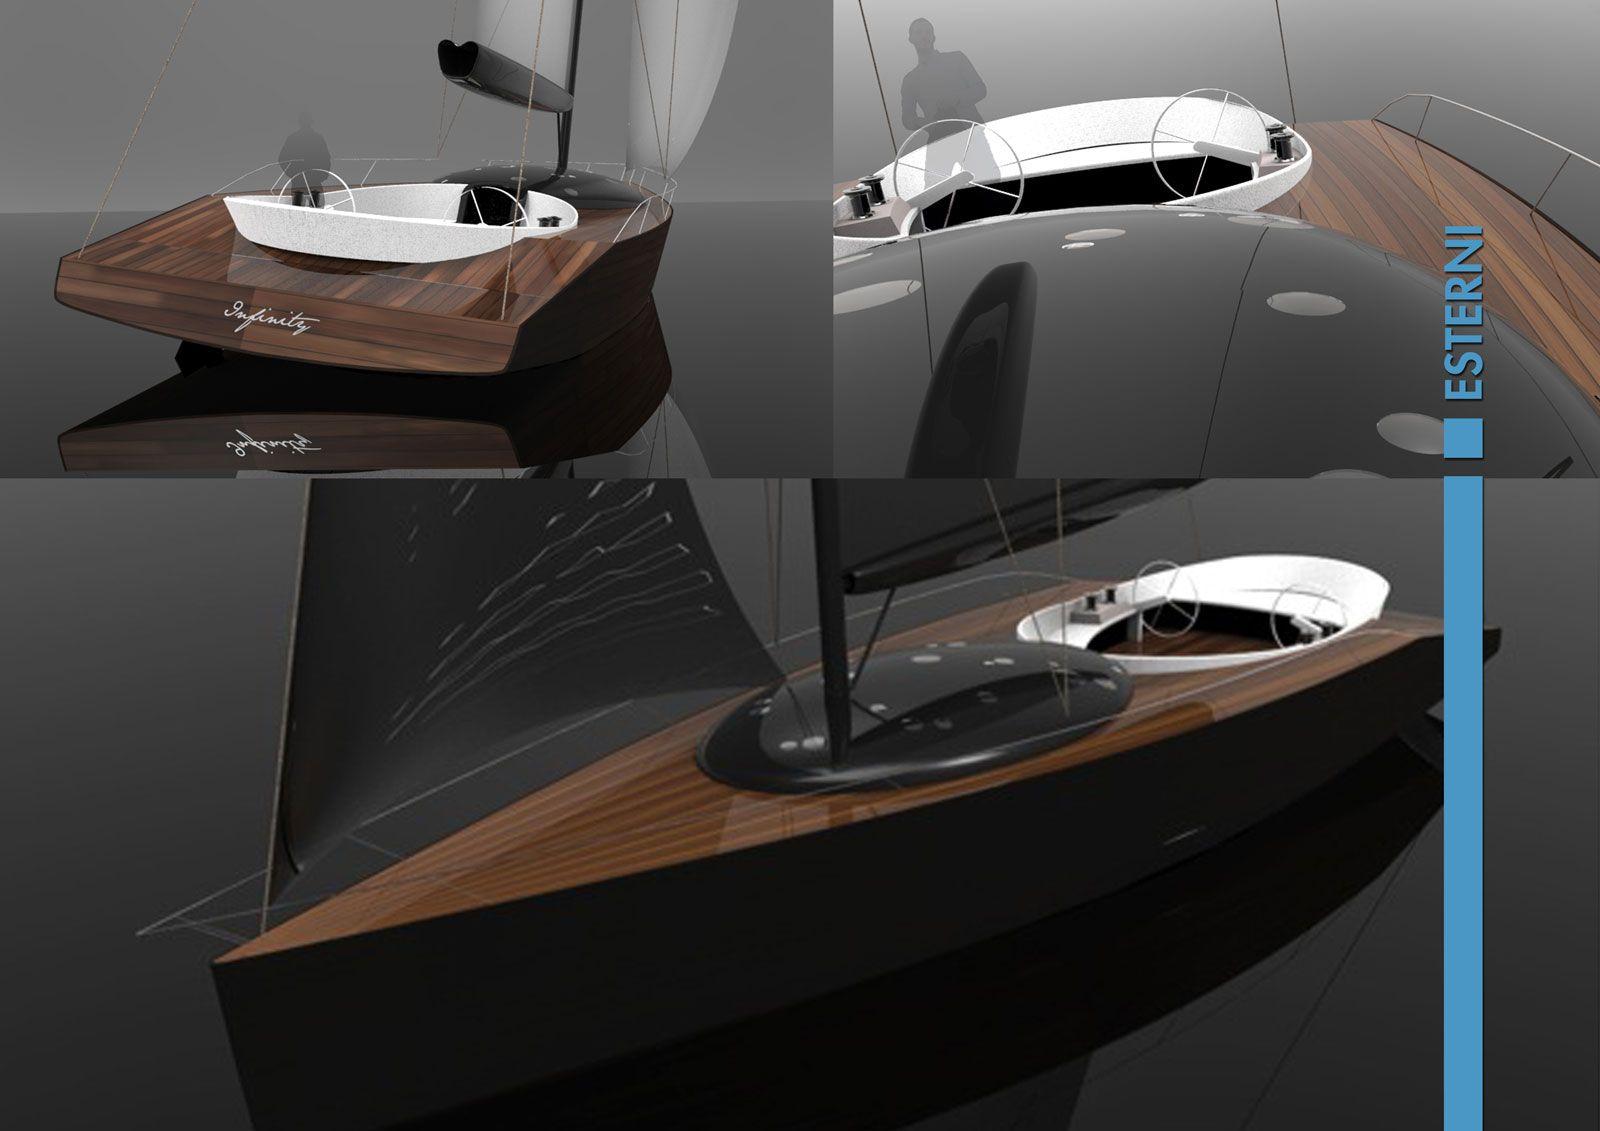 Infinity Sailing Boat Concept - Exterior Renderings - Car Body Design